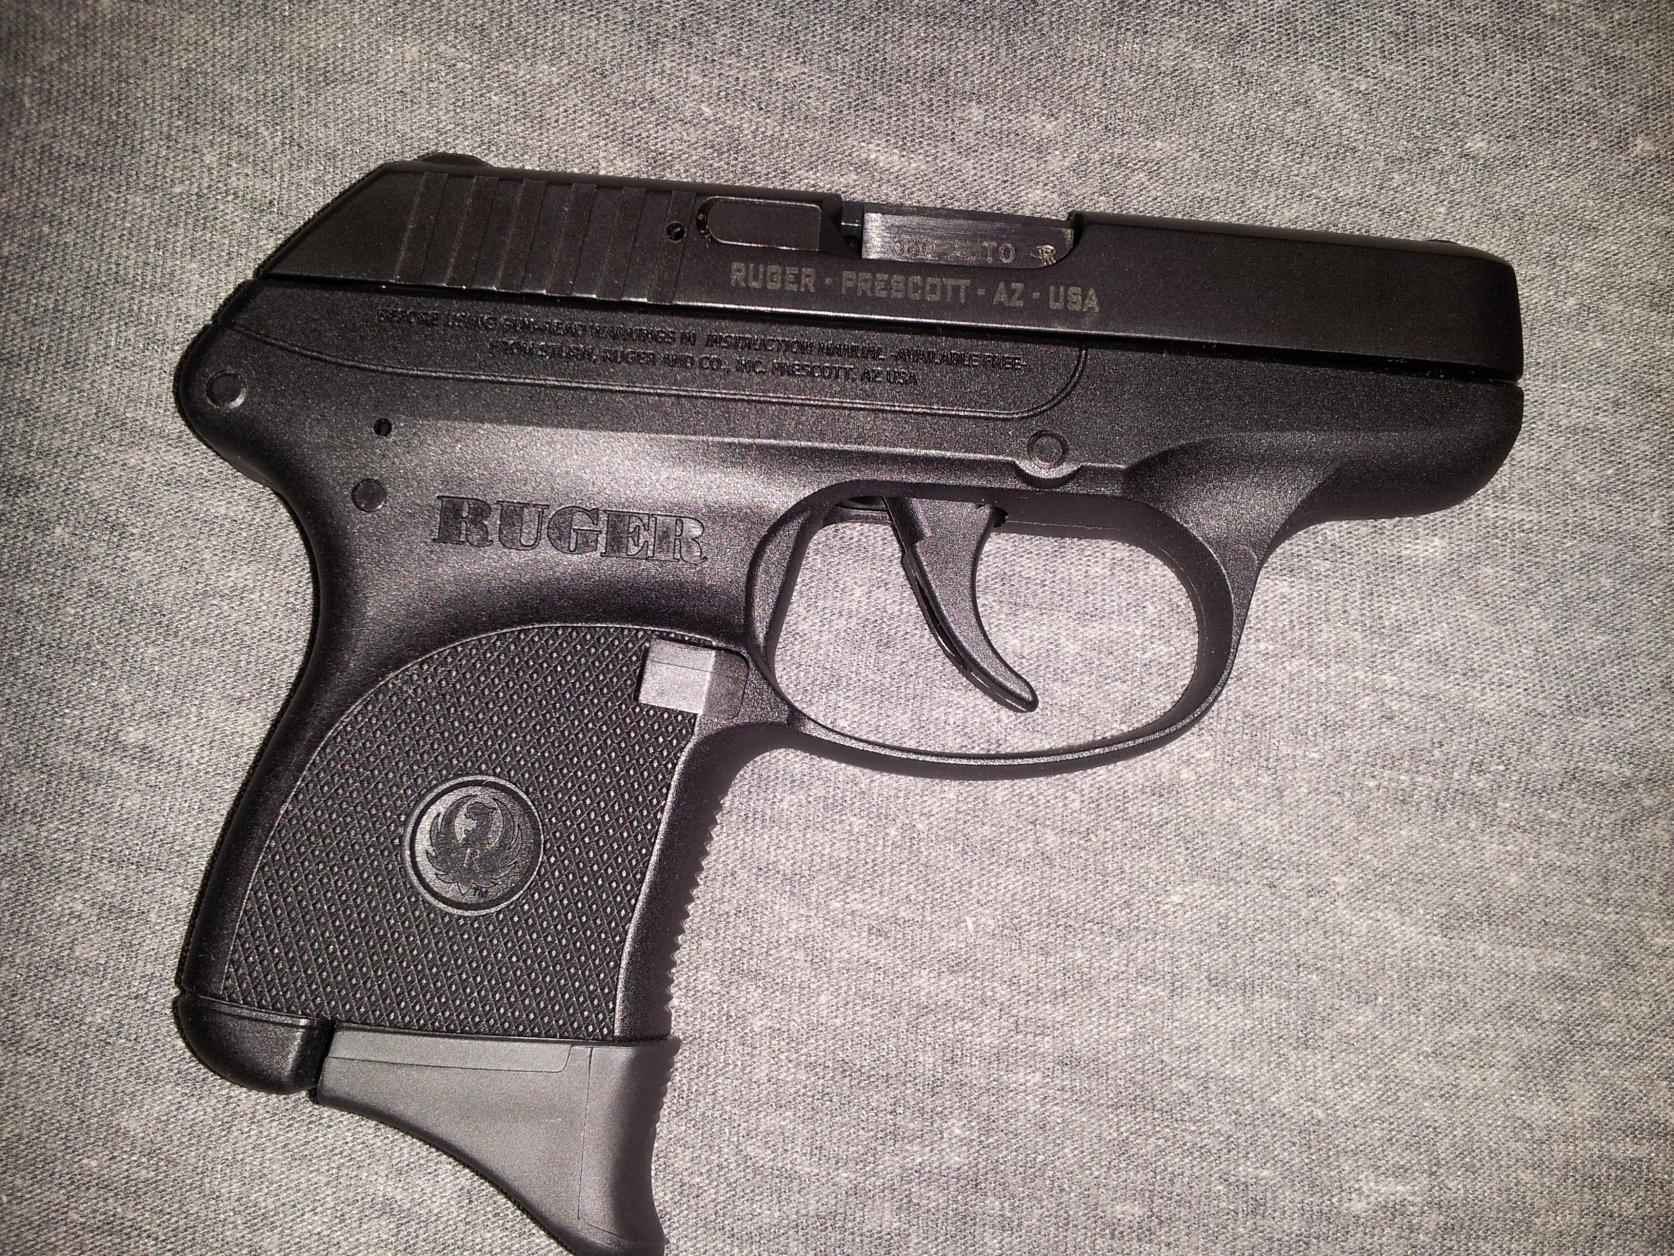 New Pocket Gun-image.jpg